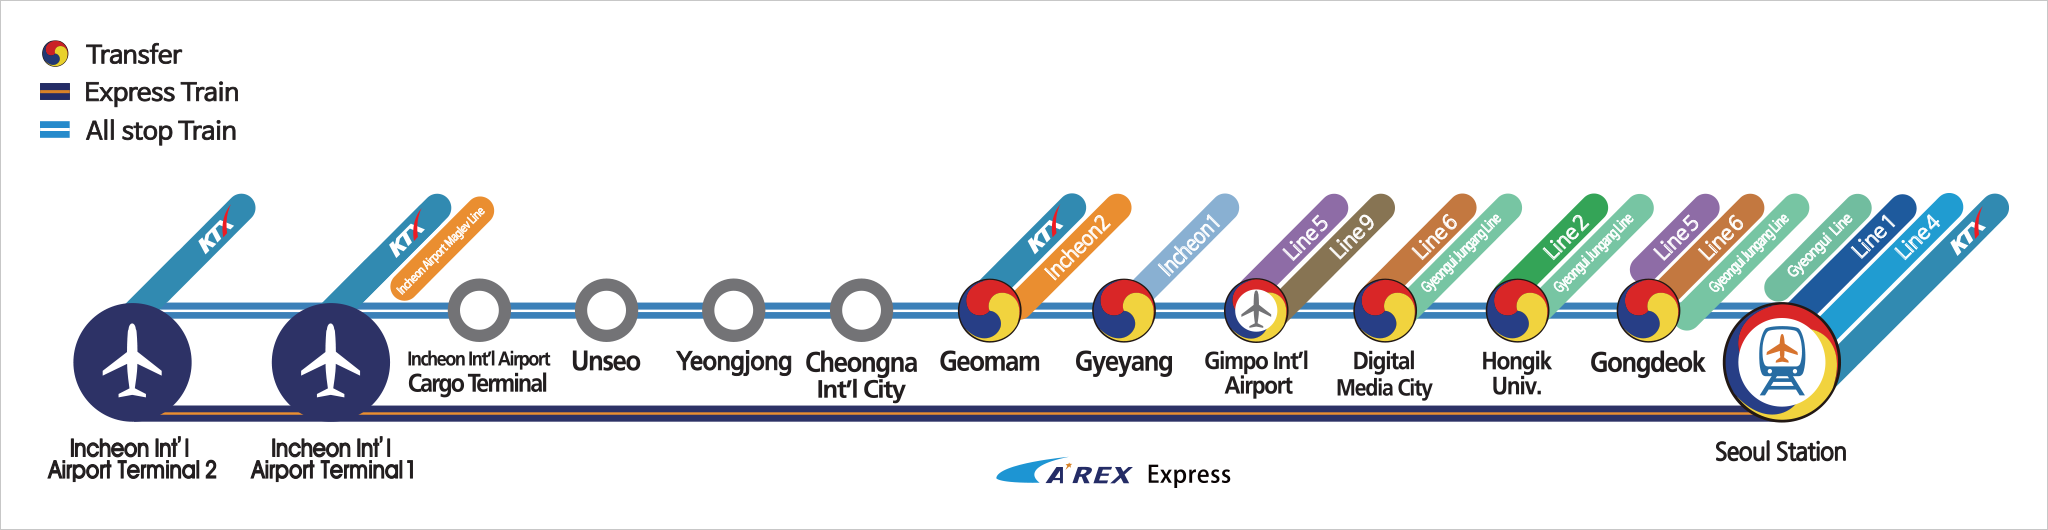 Seoul airport line